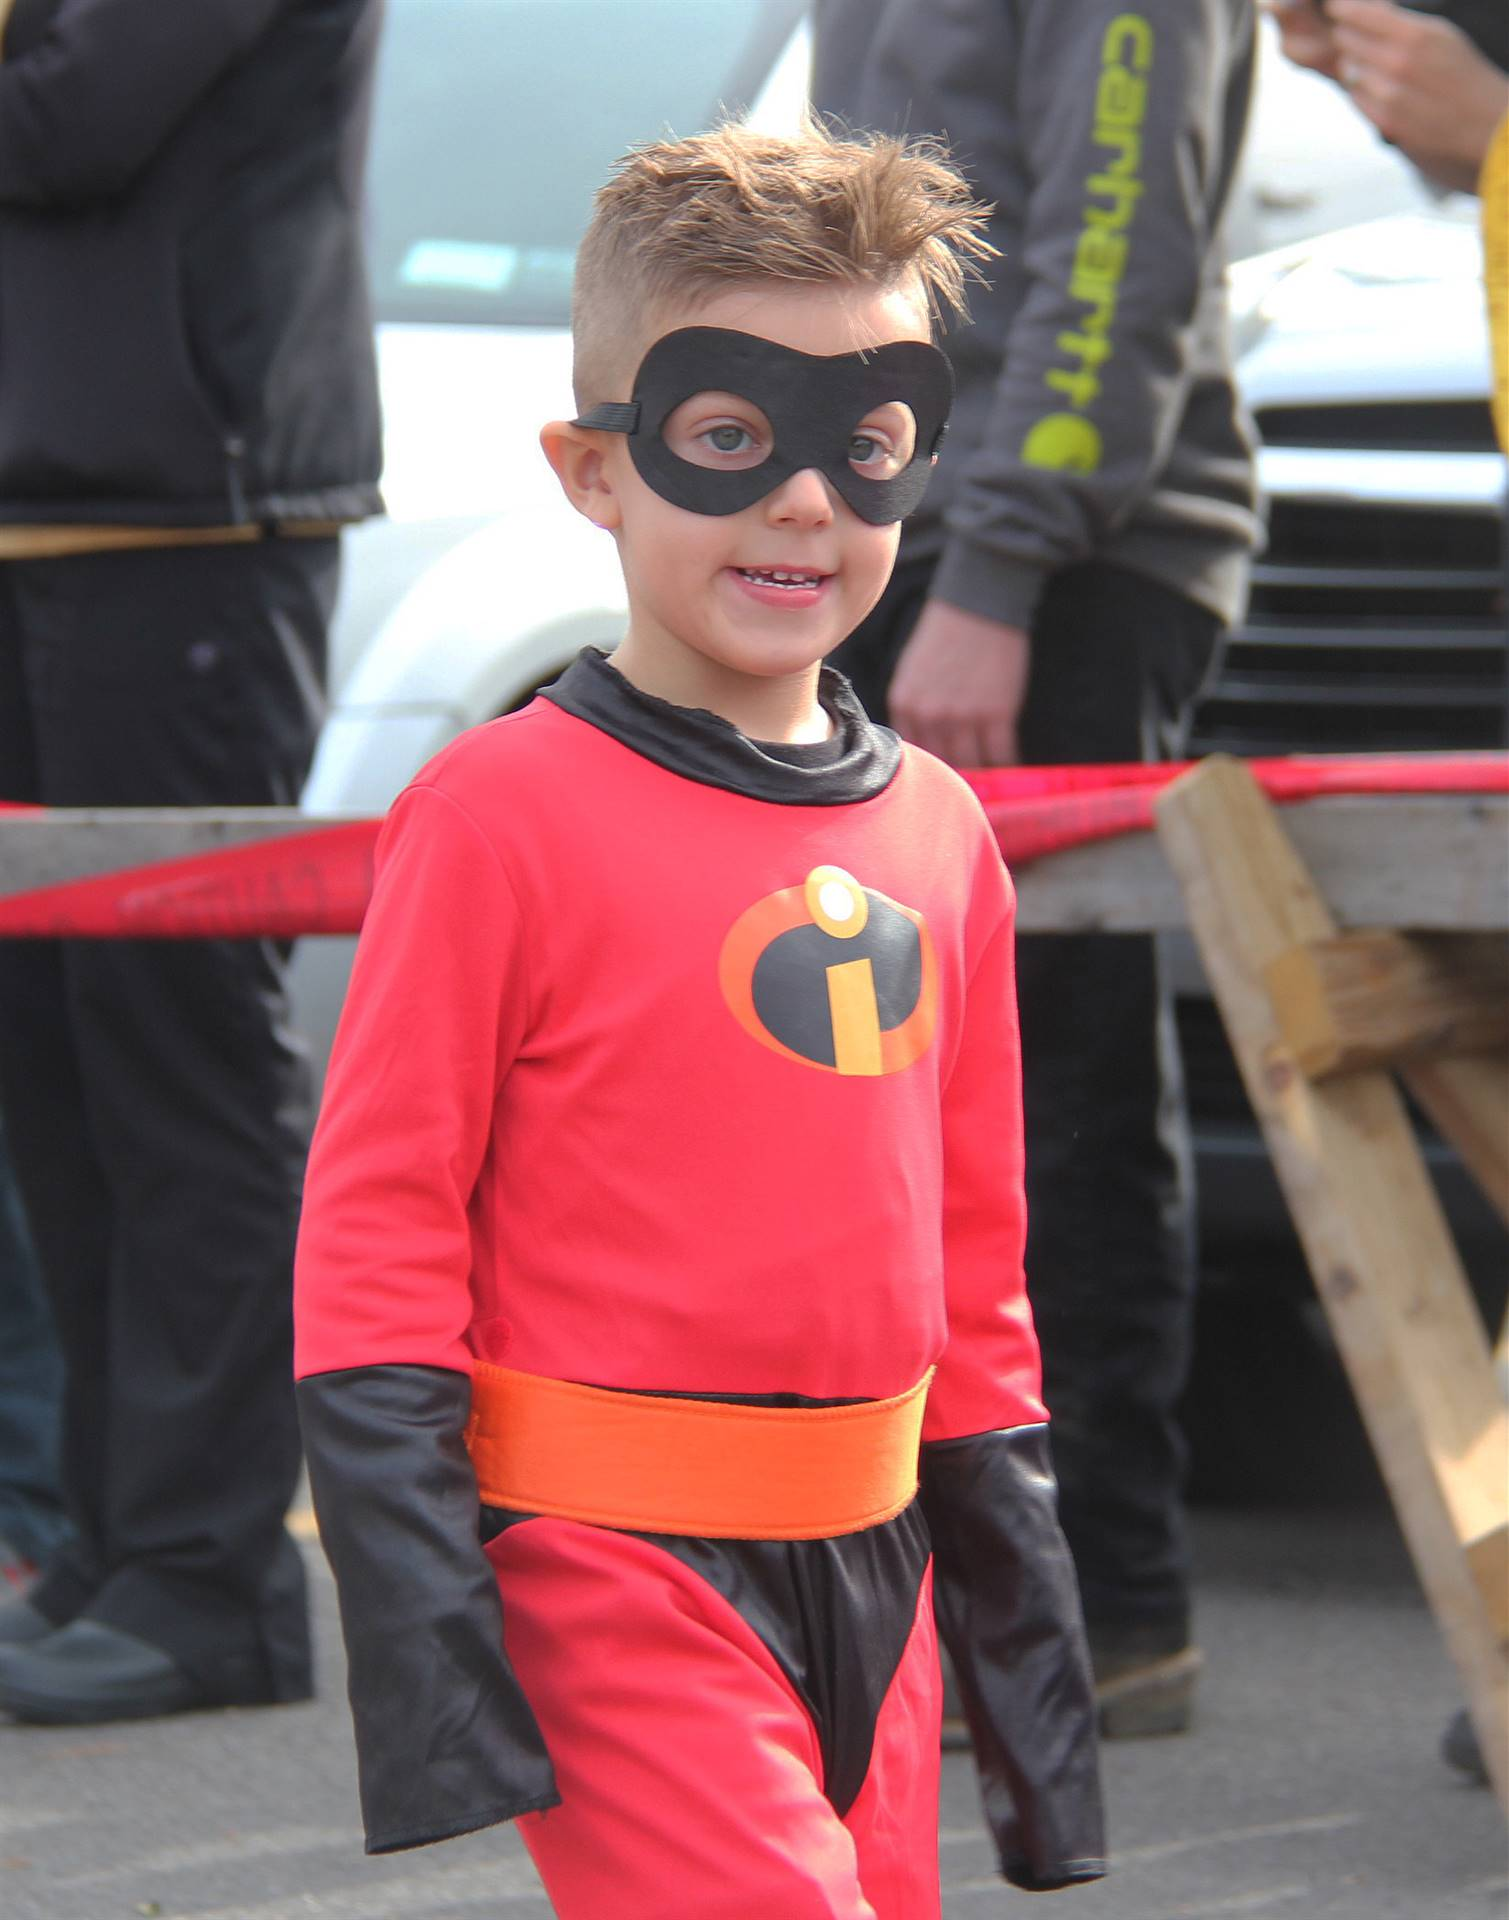 student wearing halloween costume